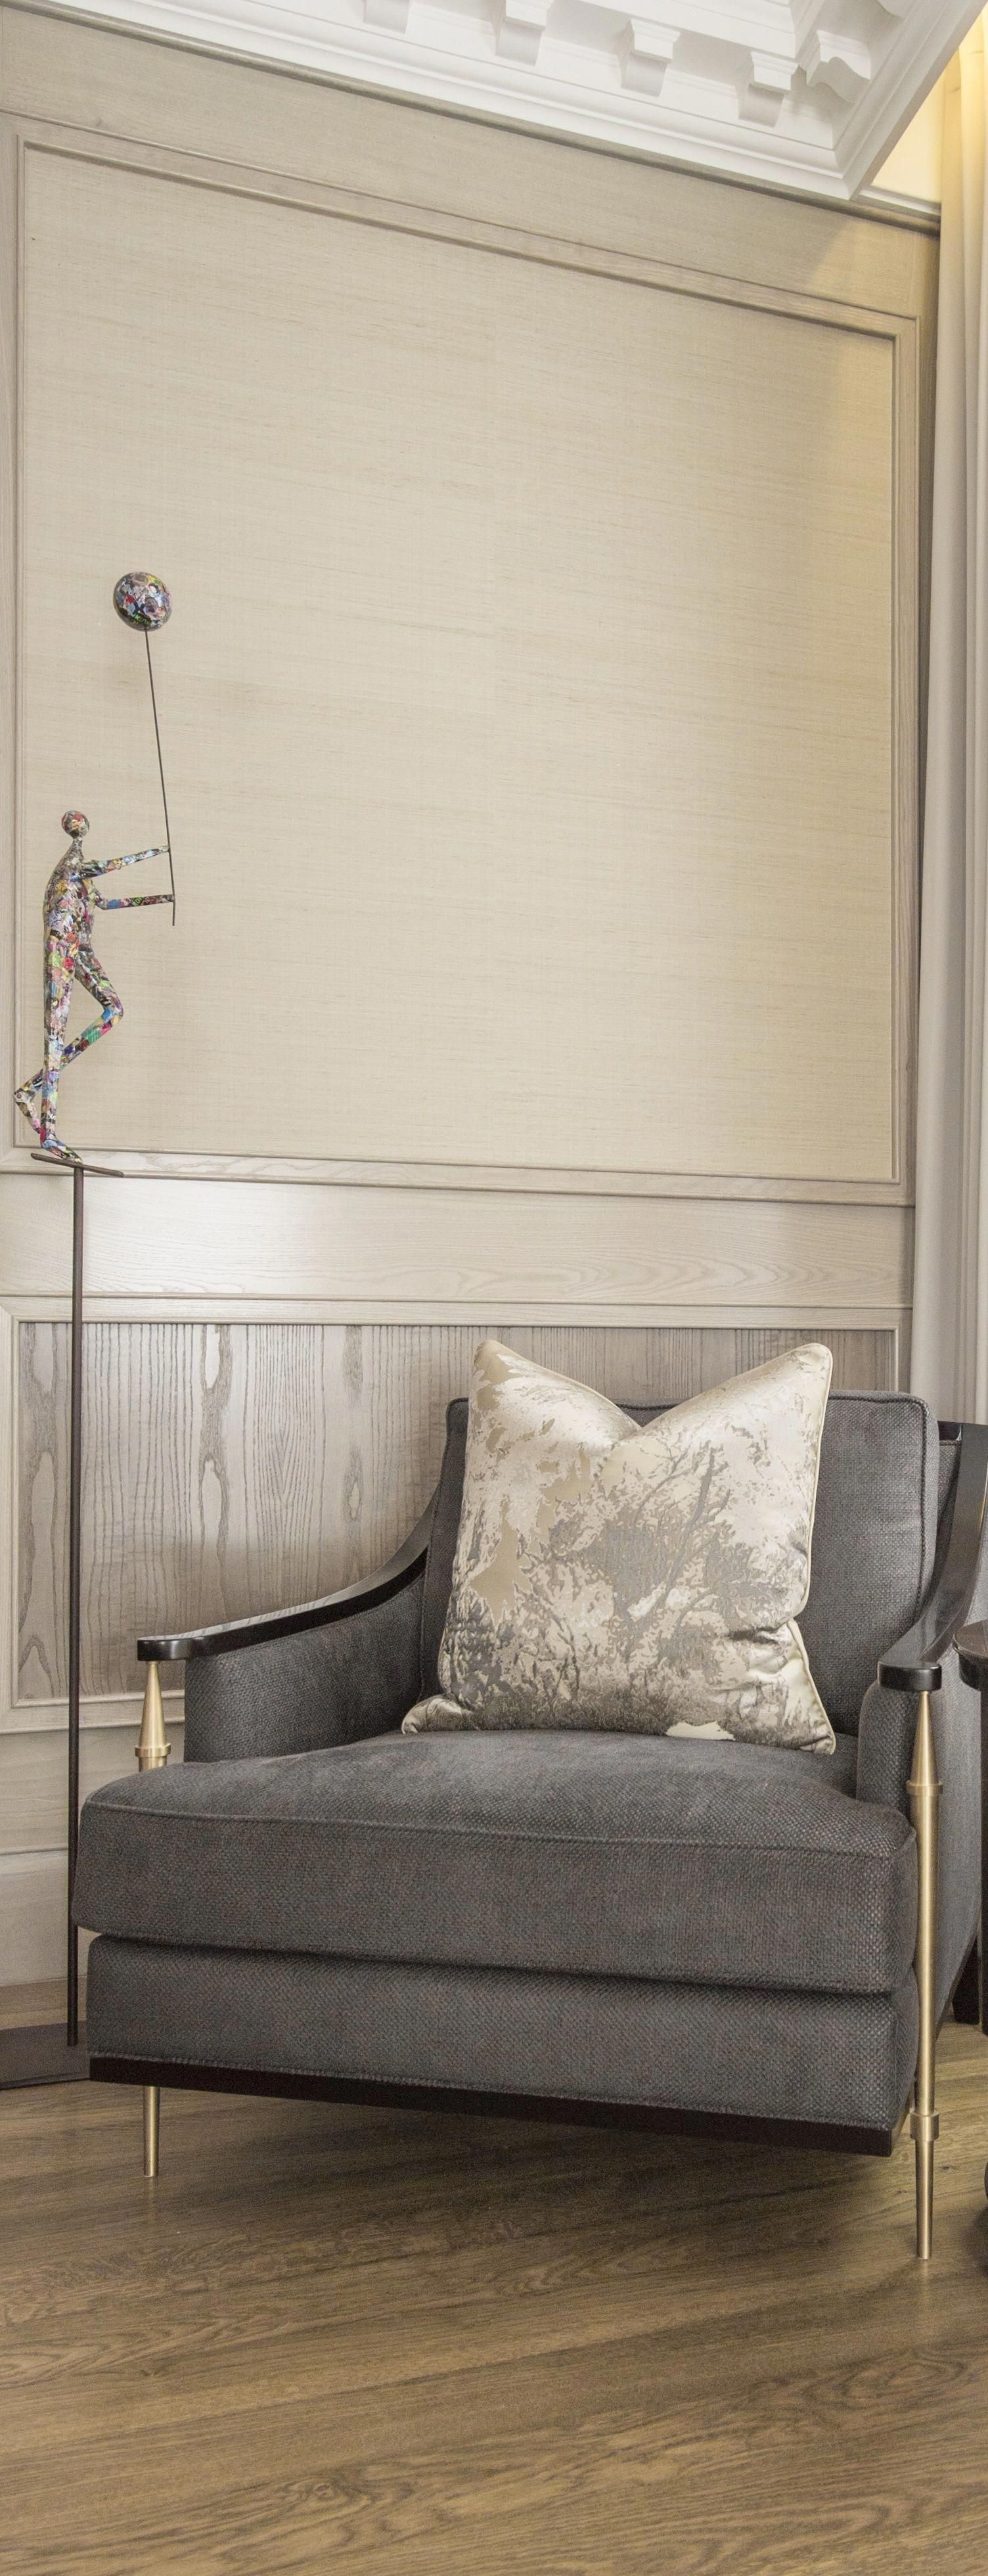 Bedroom Creator Online: Furniture Casters #BuyFurnitureOnlineCheap ID:8581094679